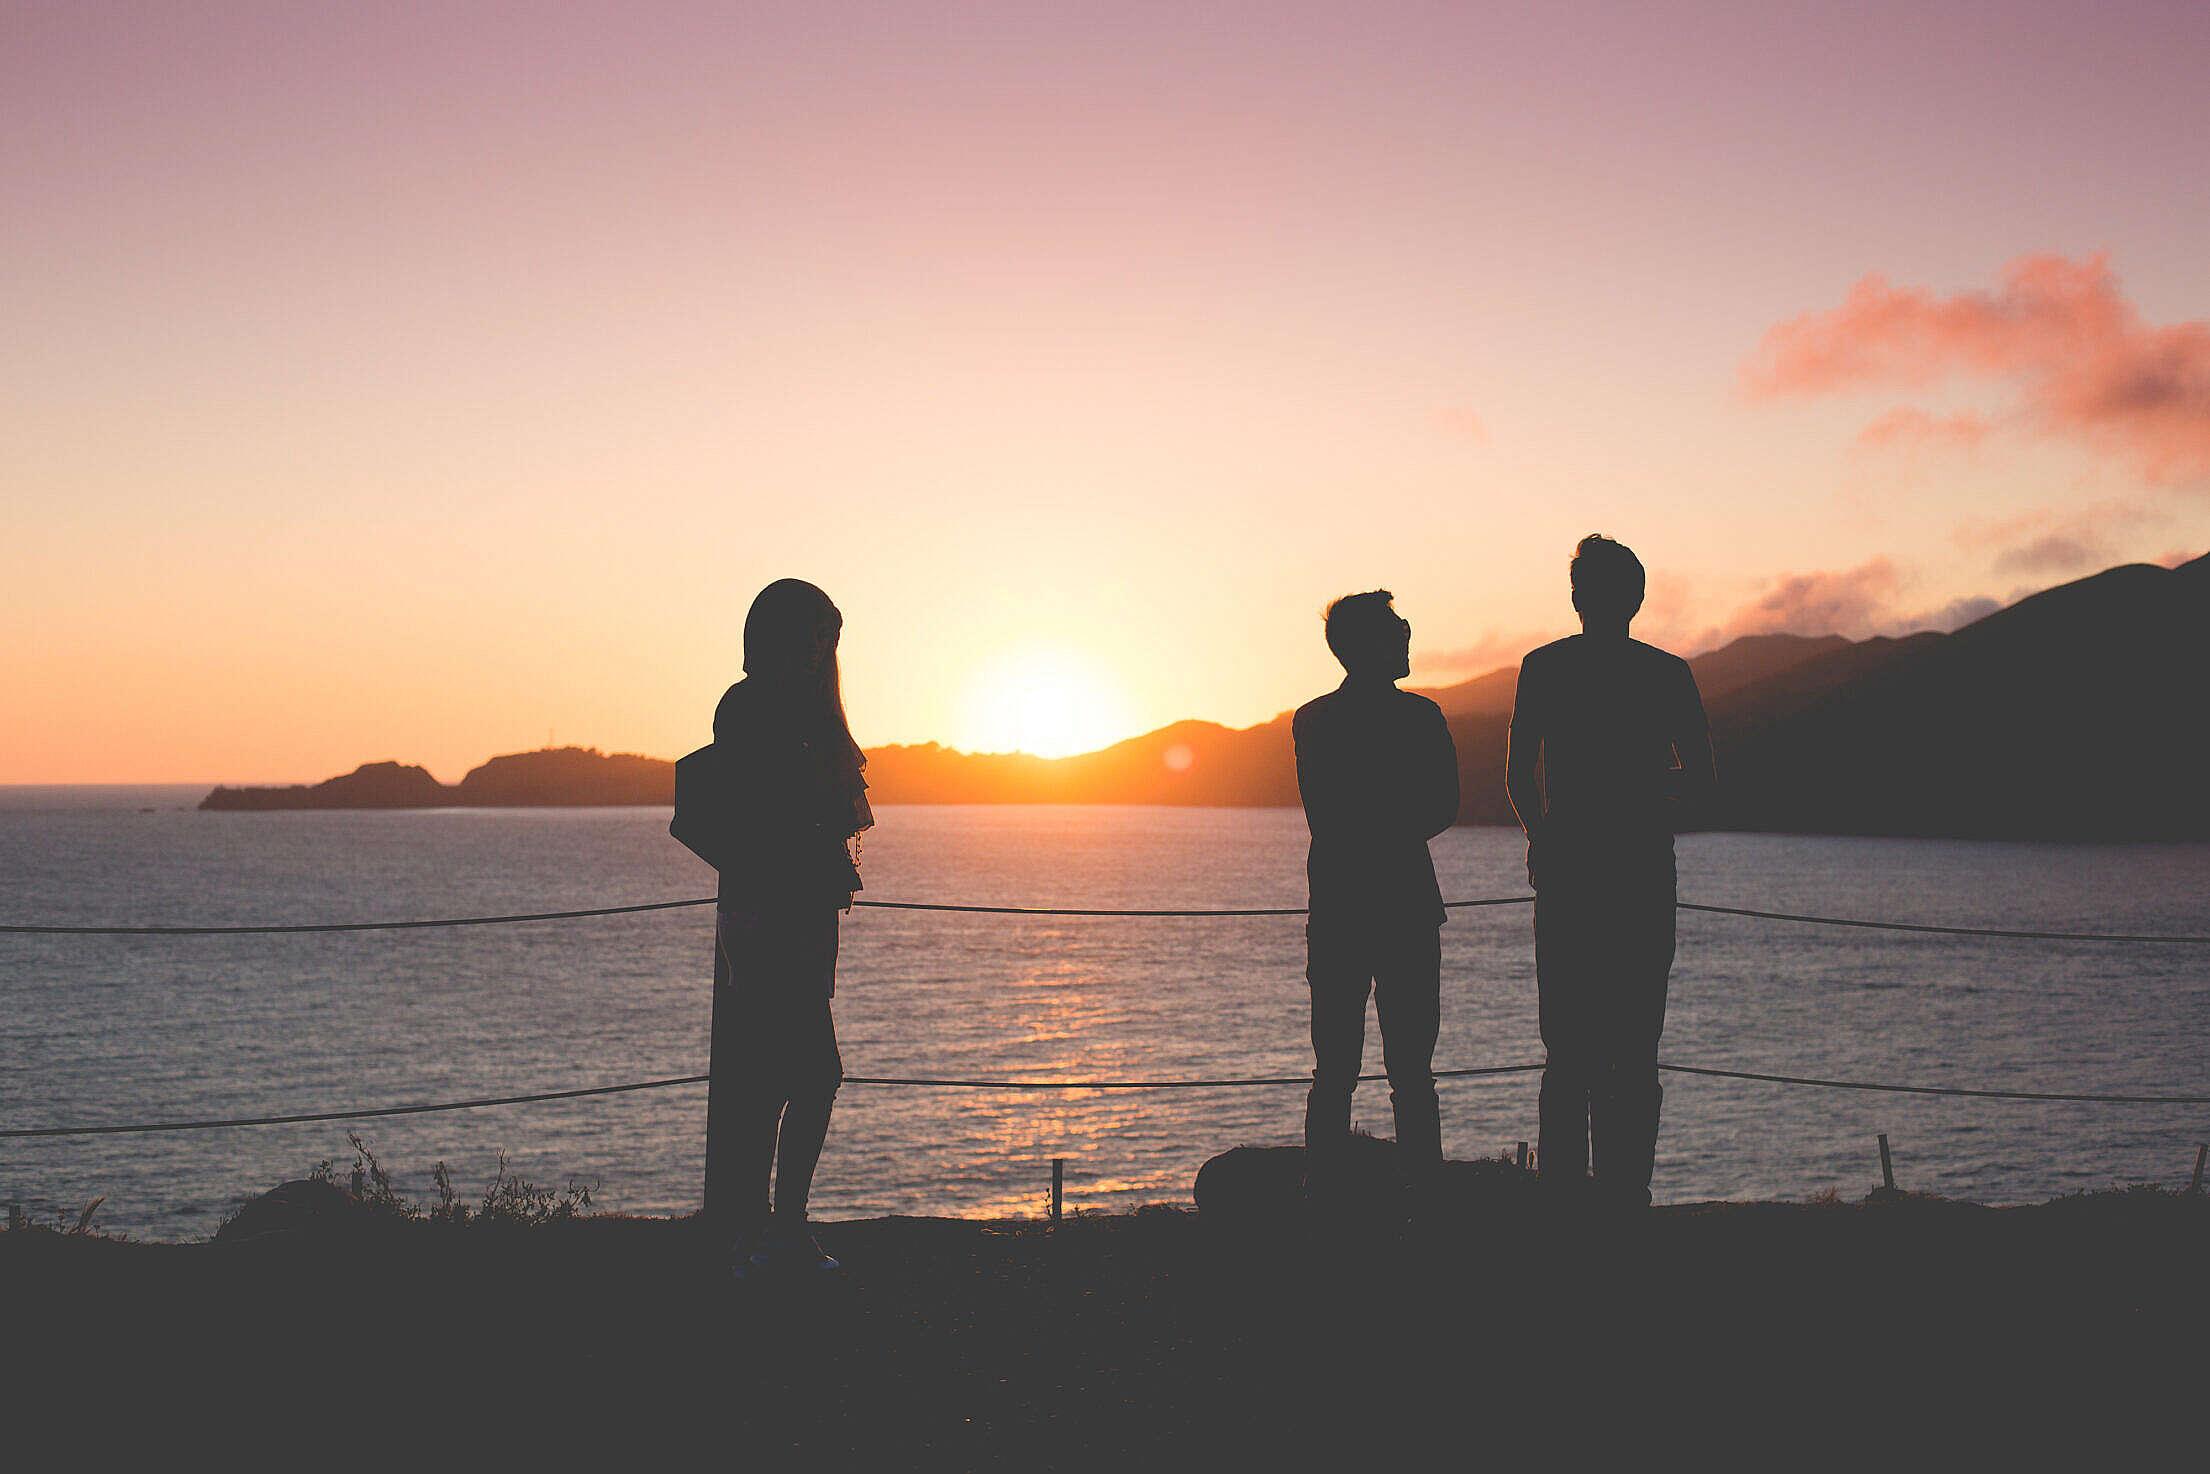 People Enjoying Sunset Over the Ocean Free Stock Photo